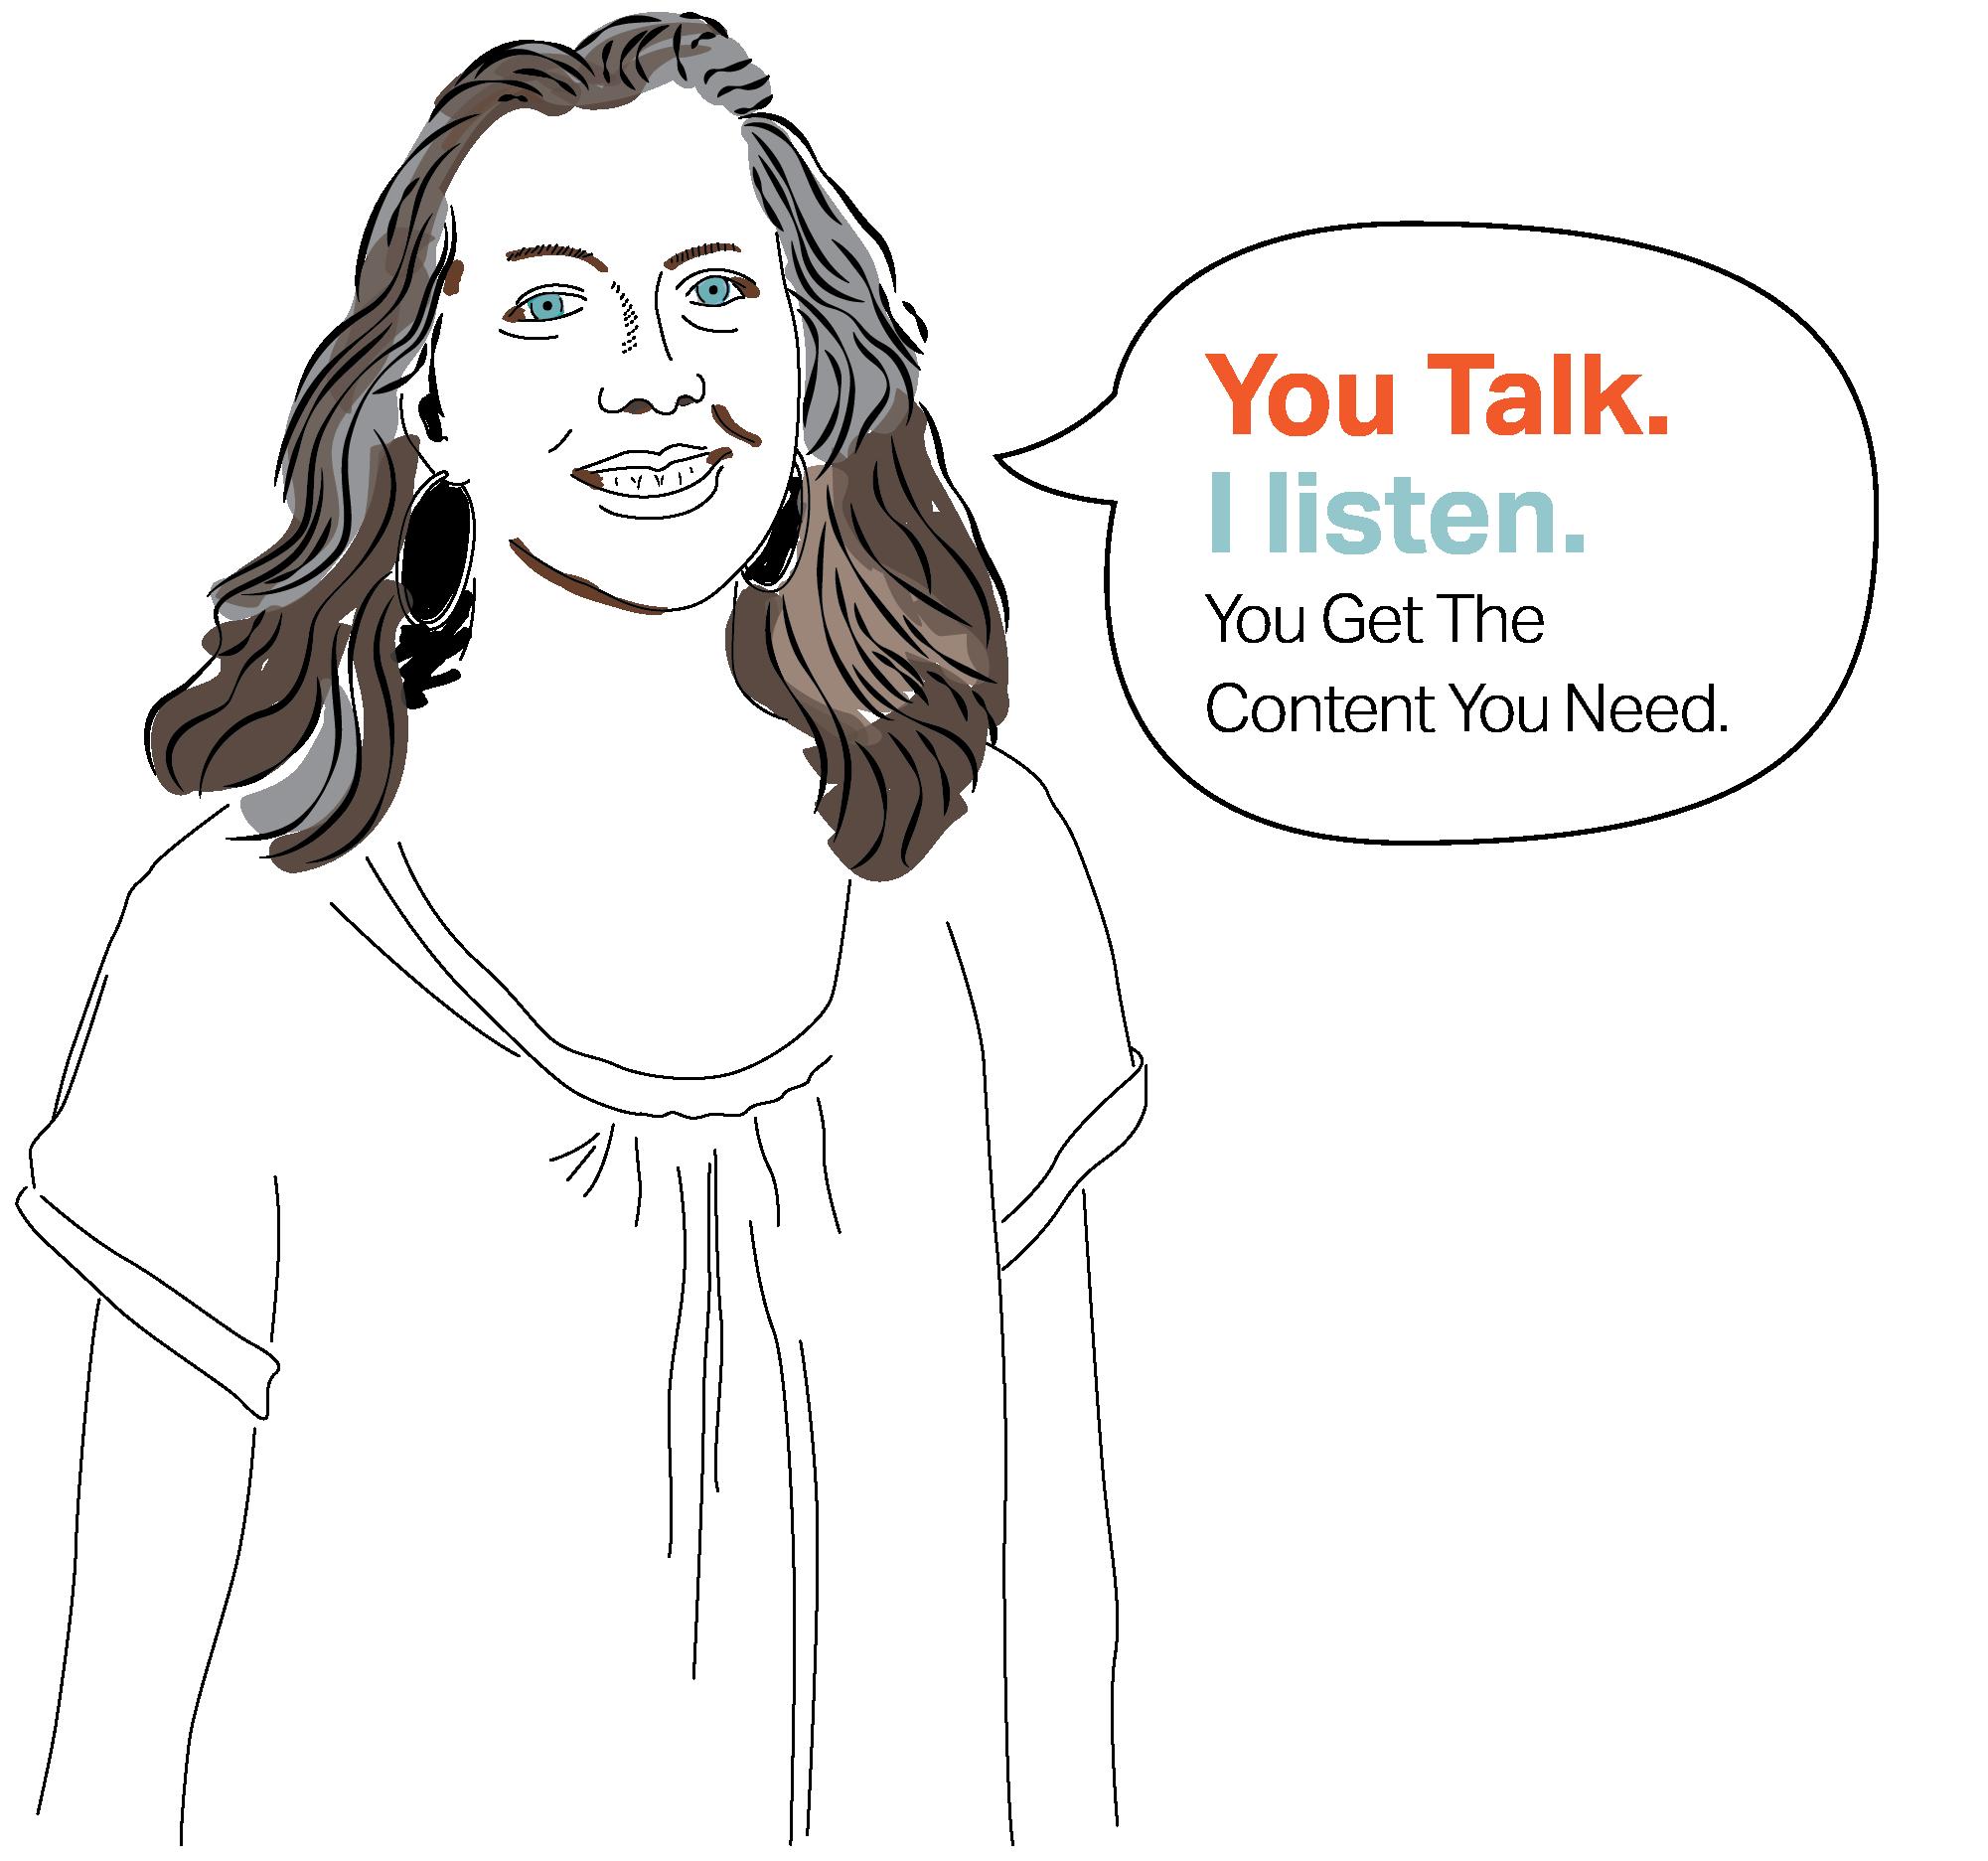 You Talk. I listen.